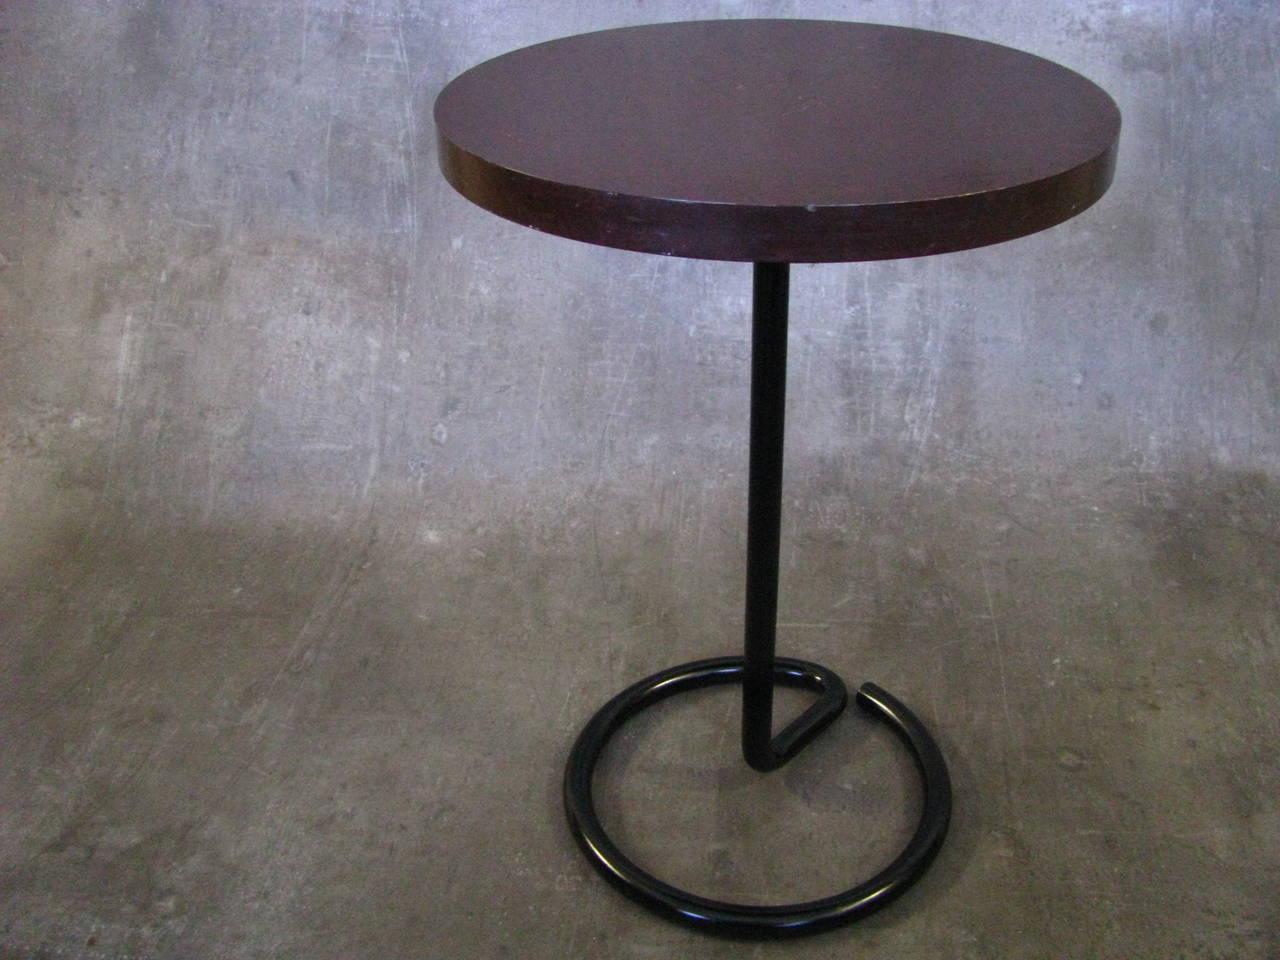 Art Deco Side Coffee Table by Rene Herbst Bakelite, 1940 For Sale 5